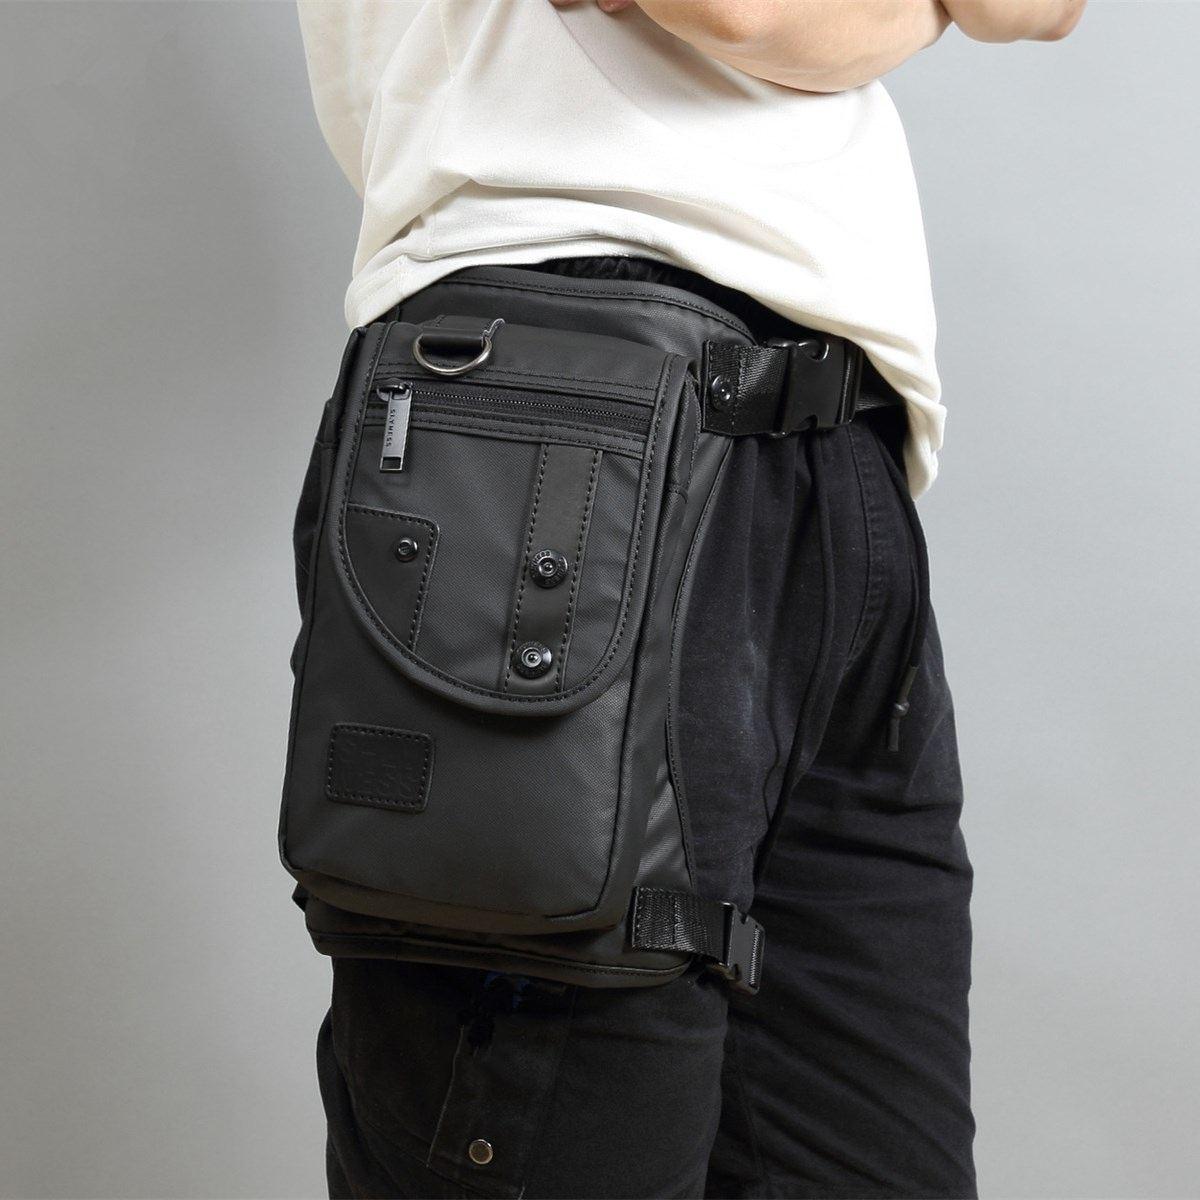 New Fashion Men Oxford Drop Leg Bag Fanny Waist Pack Thigh Hip Bum Belt Casual Shoulder Bag Motorcycle Riding Travel Military